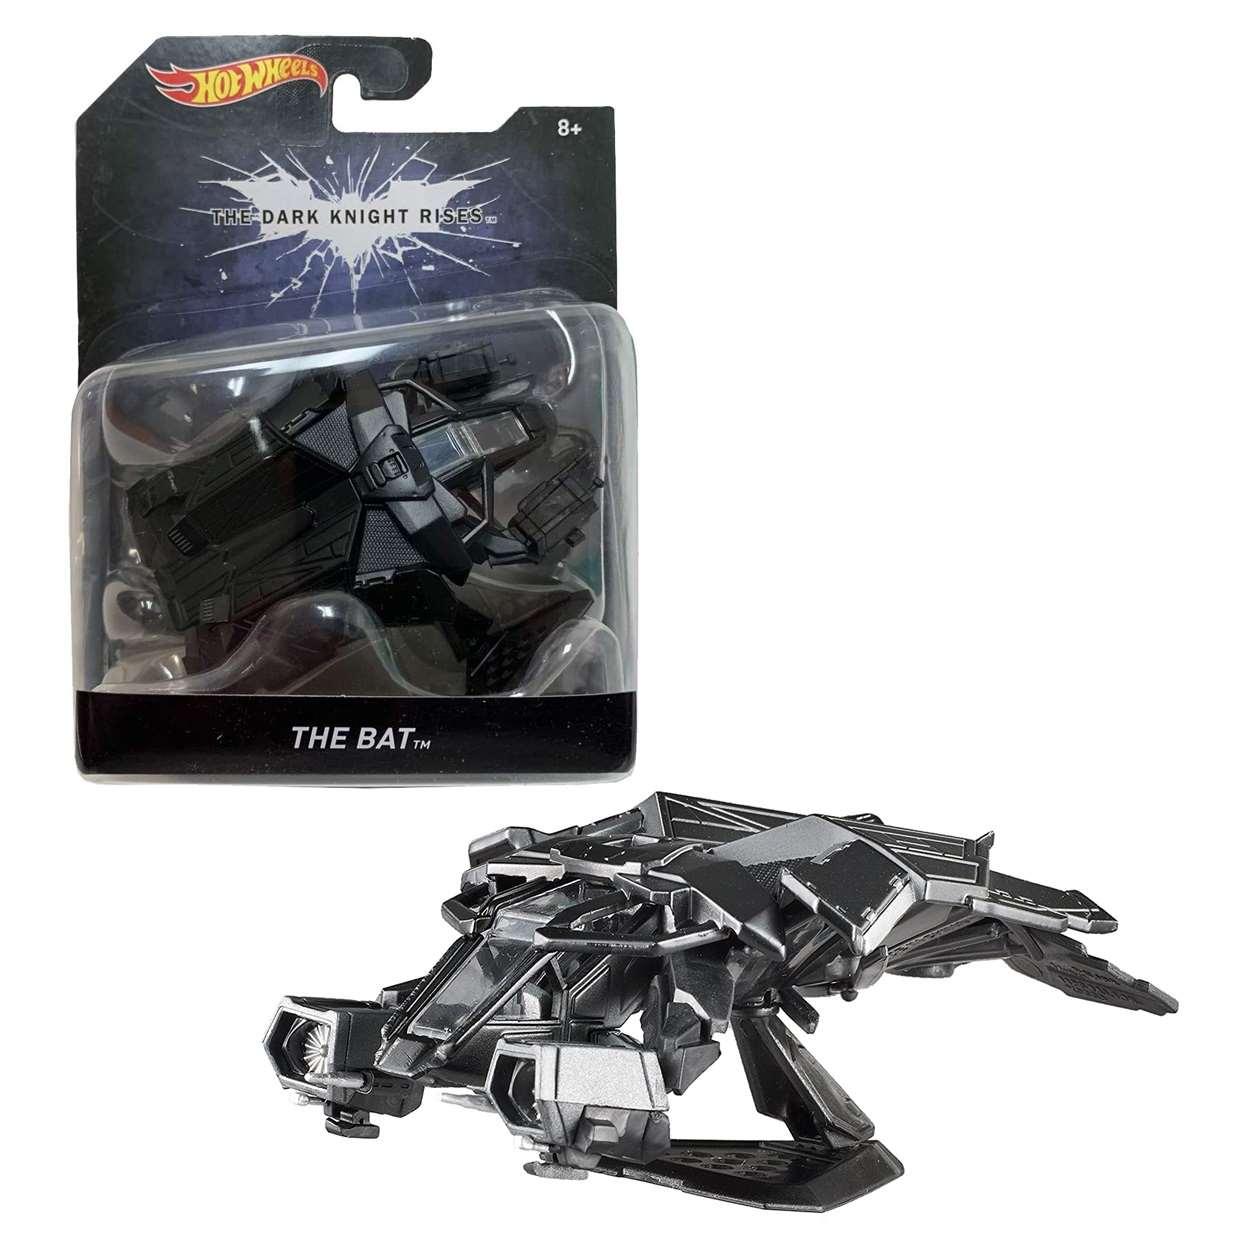 The Bat Batmobile DKL20 Hot Wheels The Dark Knights Rises